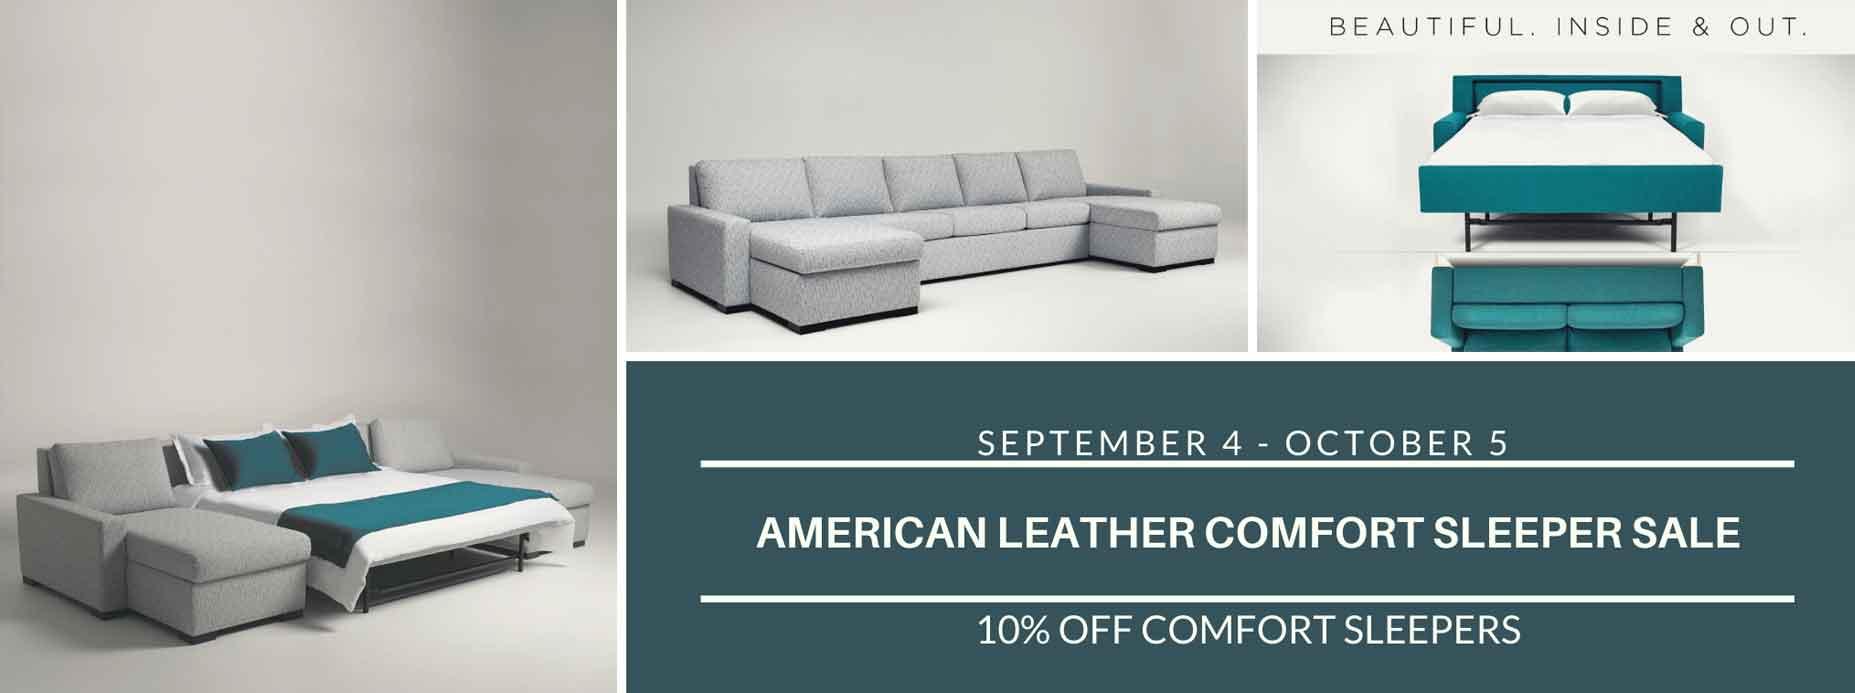 10% OFF American Leather Comfort Sleeper